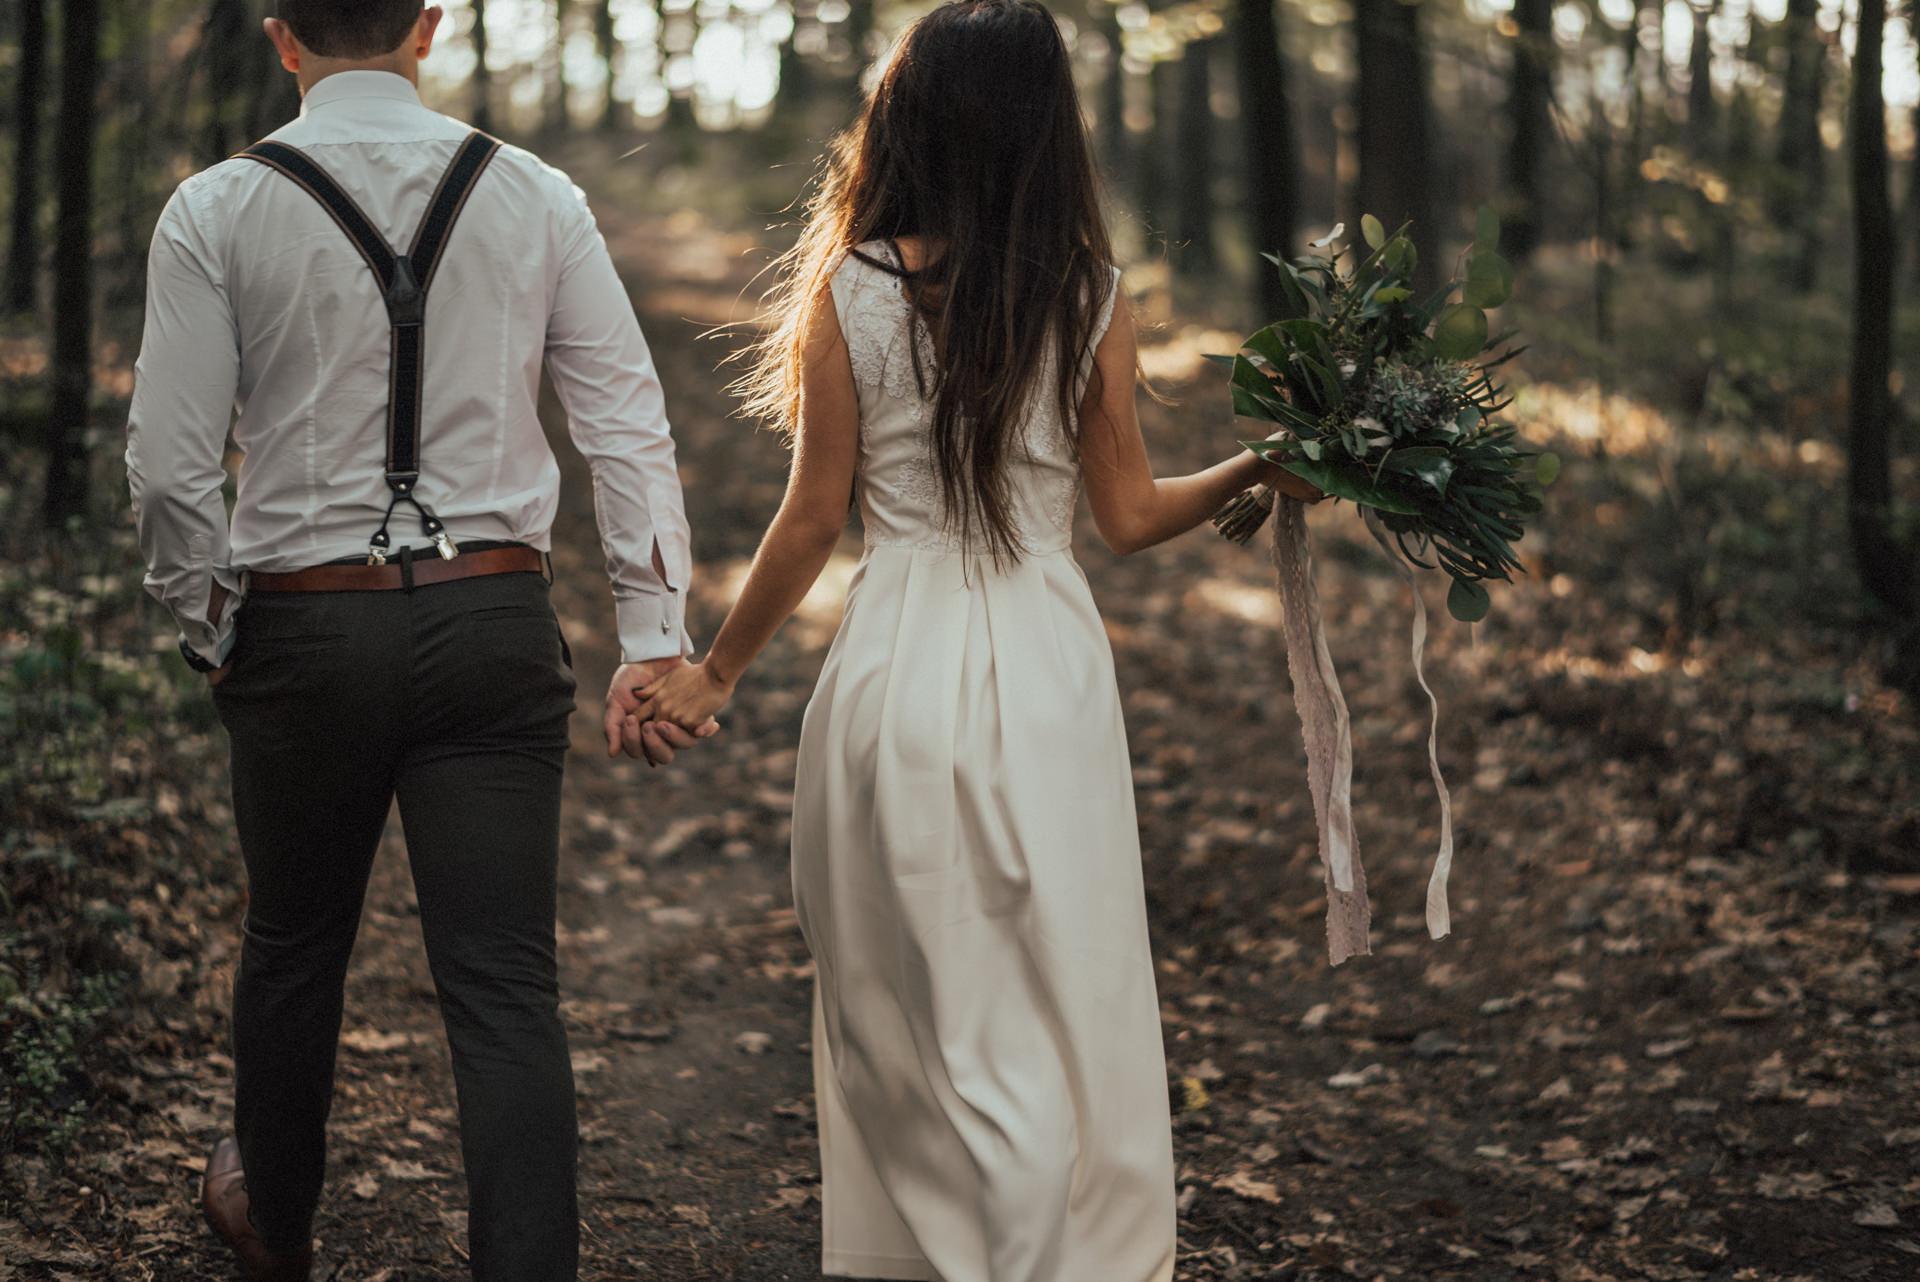 Para Młoda spacerująca po lesie